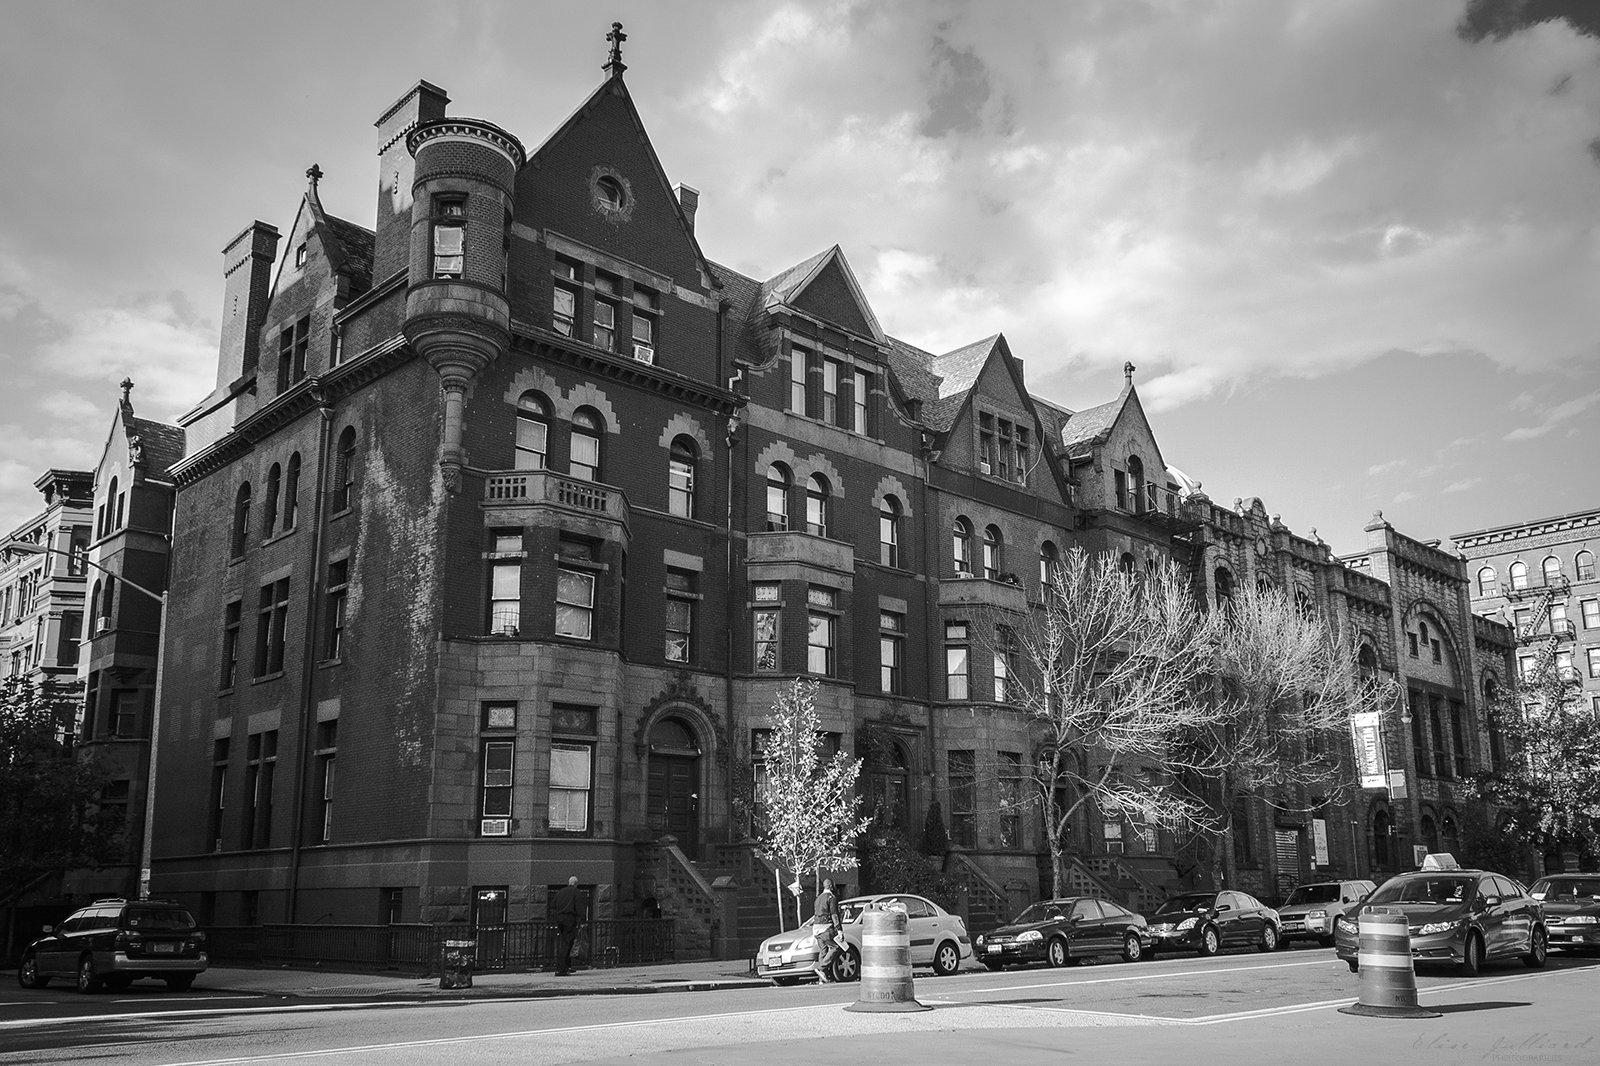 elise-julliard-photographe-etats-unis-new-york-harlem-manhattan-quartier